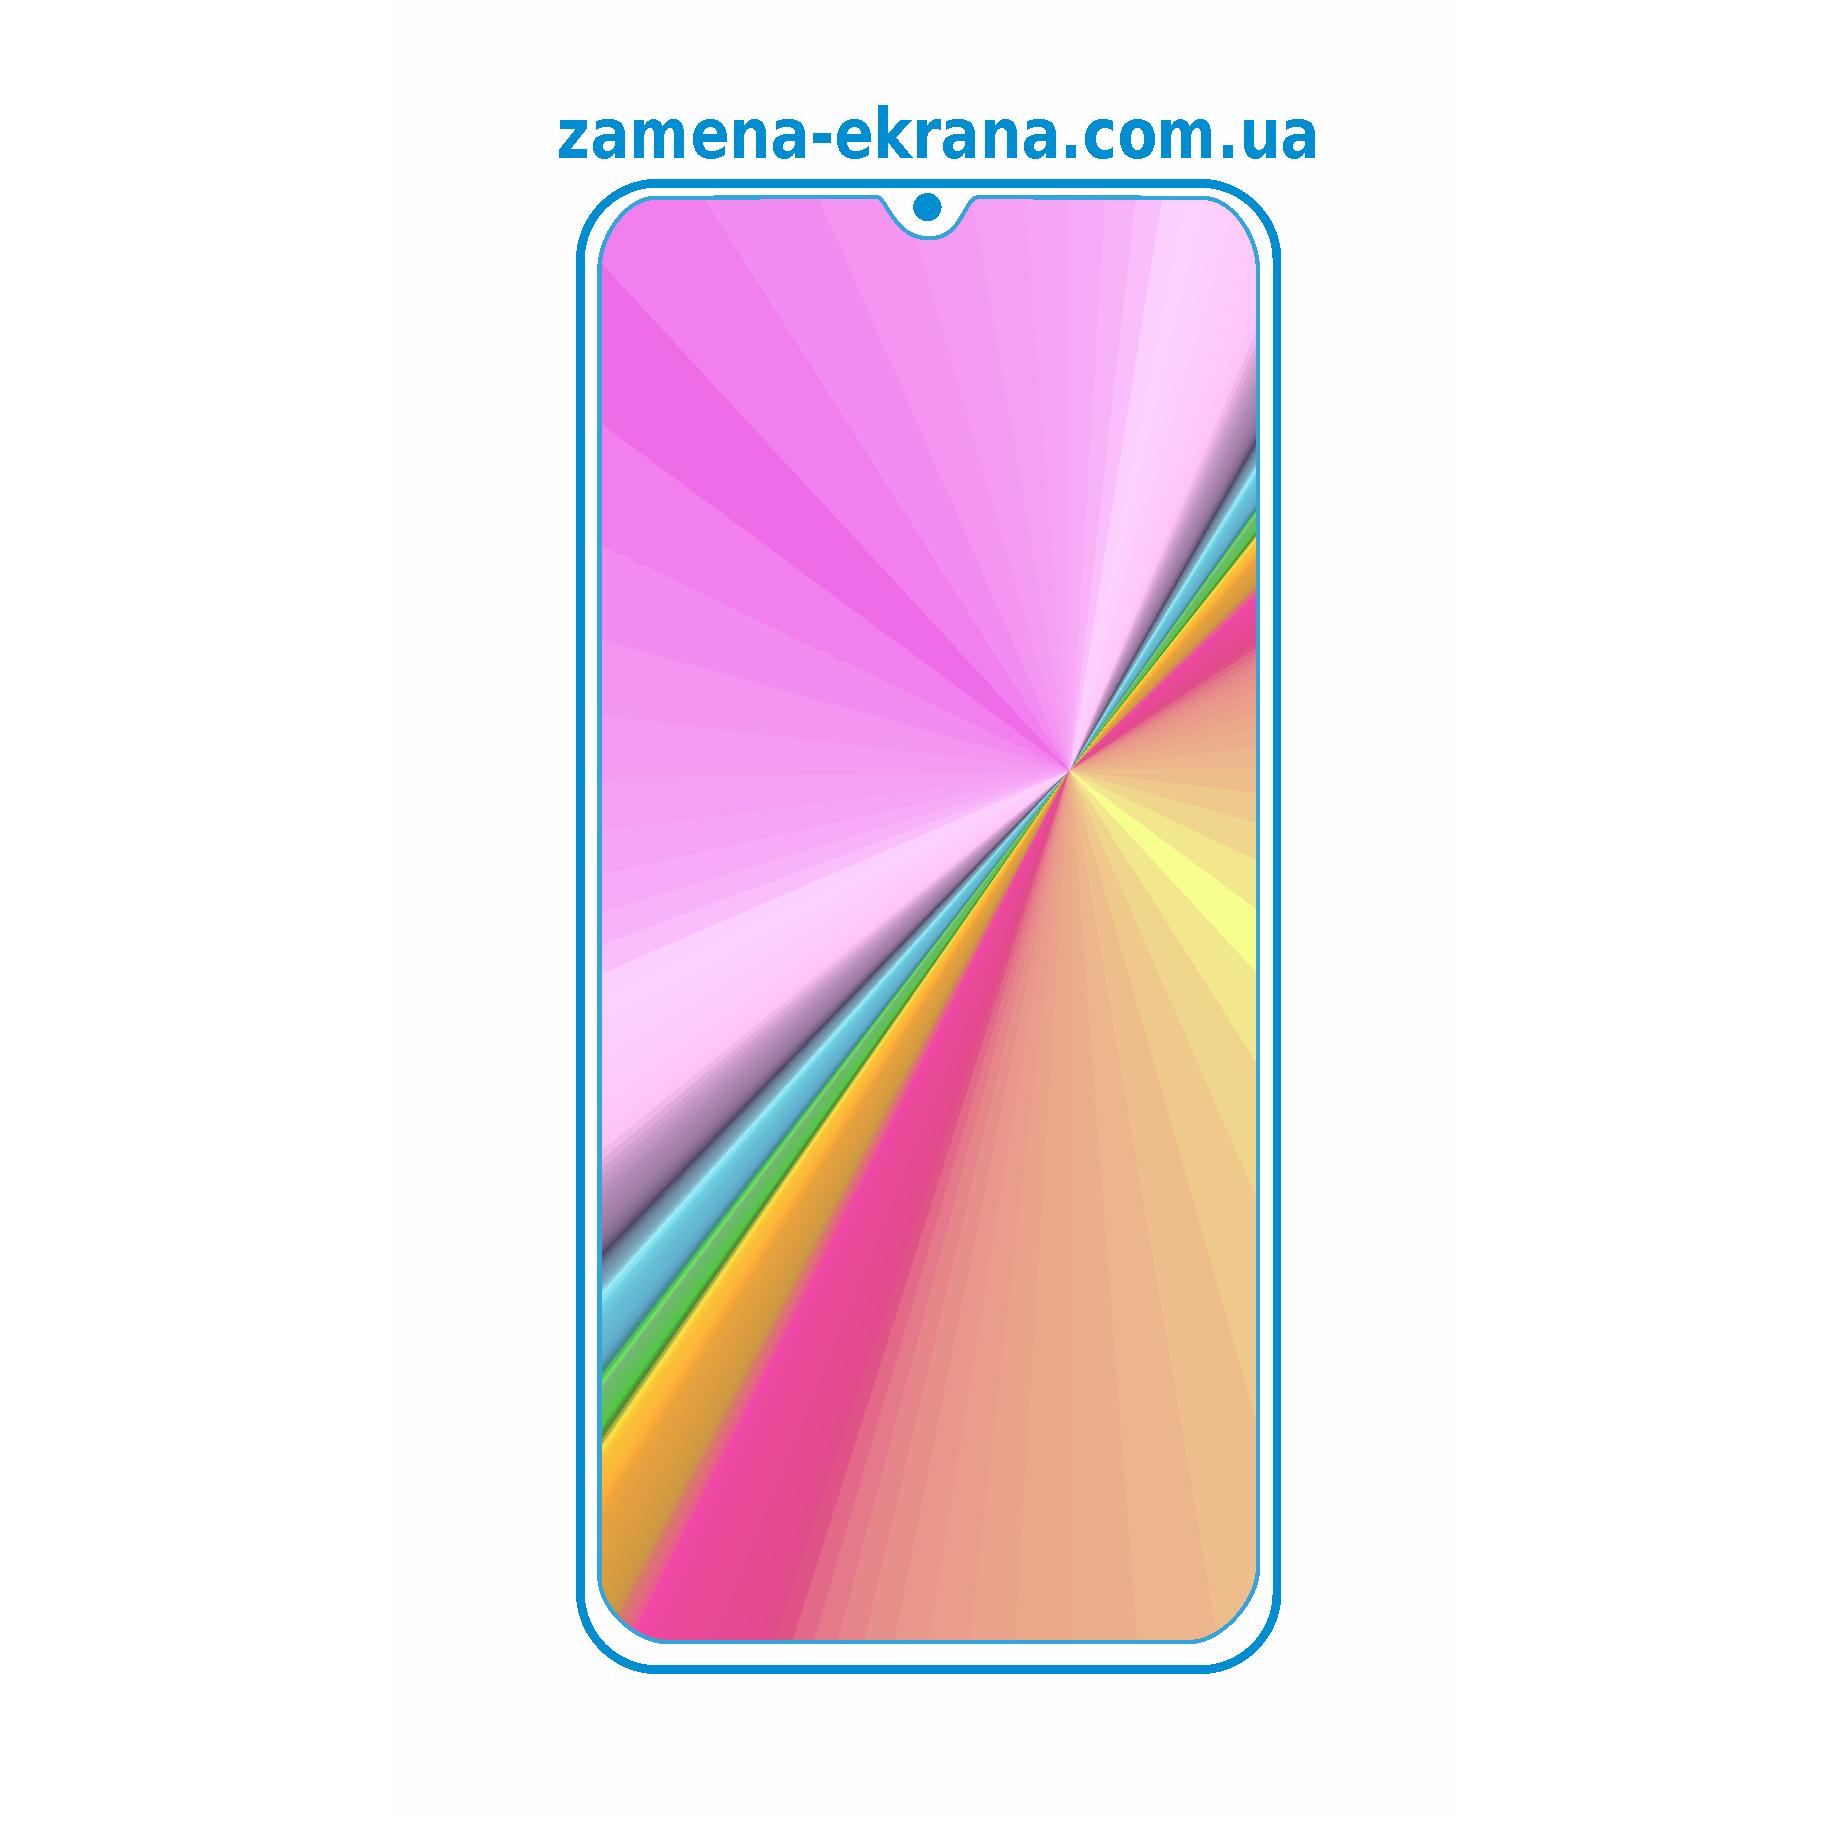 стекло для наклейки Huawei y8 p